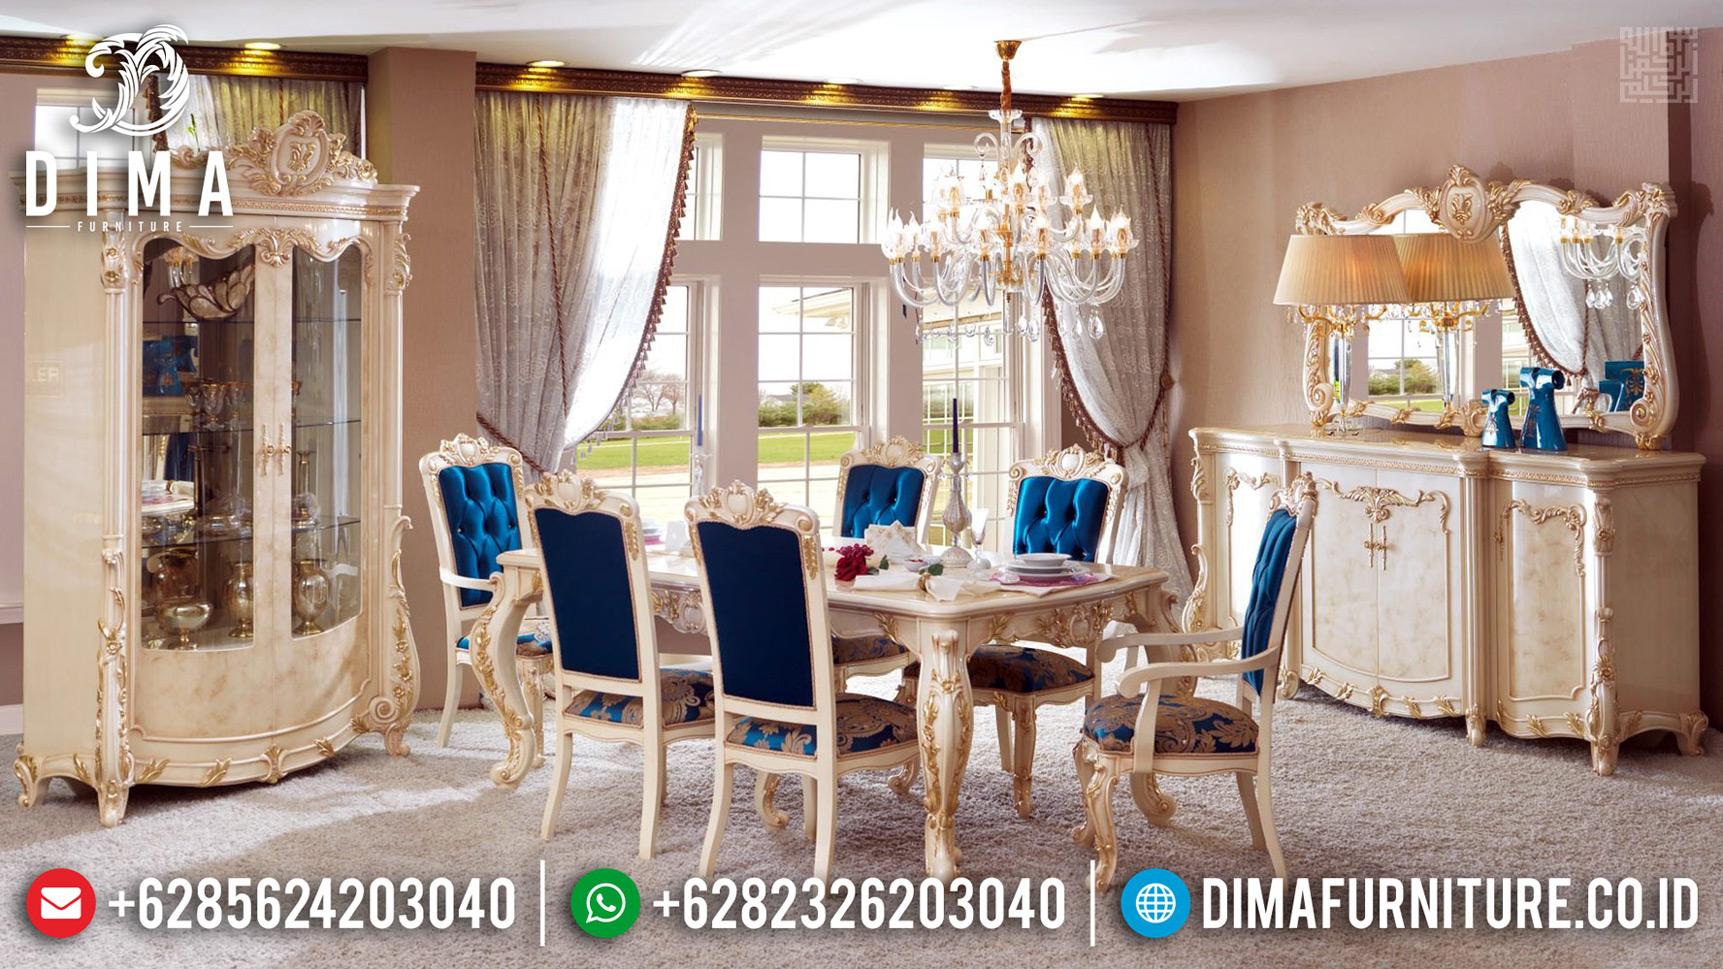 Best Sale Meja Makan Ukiran Luxury Classic Royals Furniture Jepara MMJ-0665